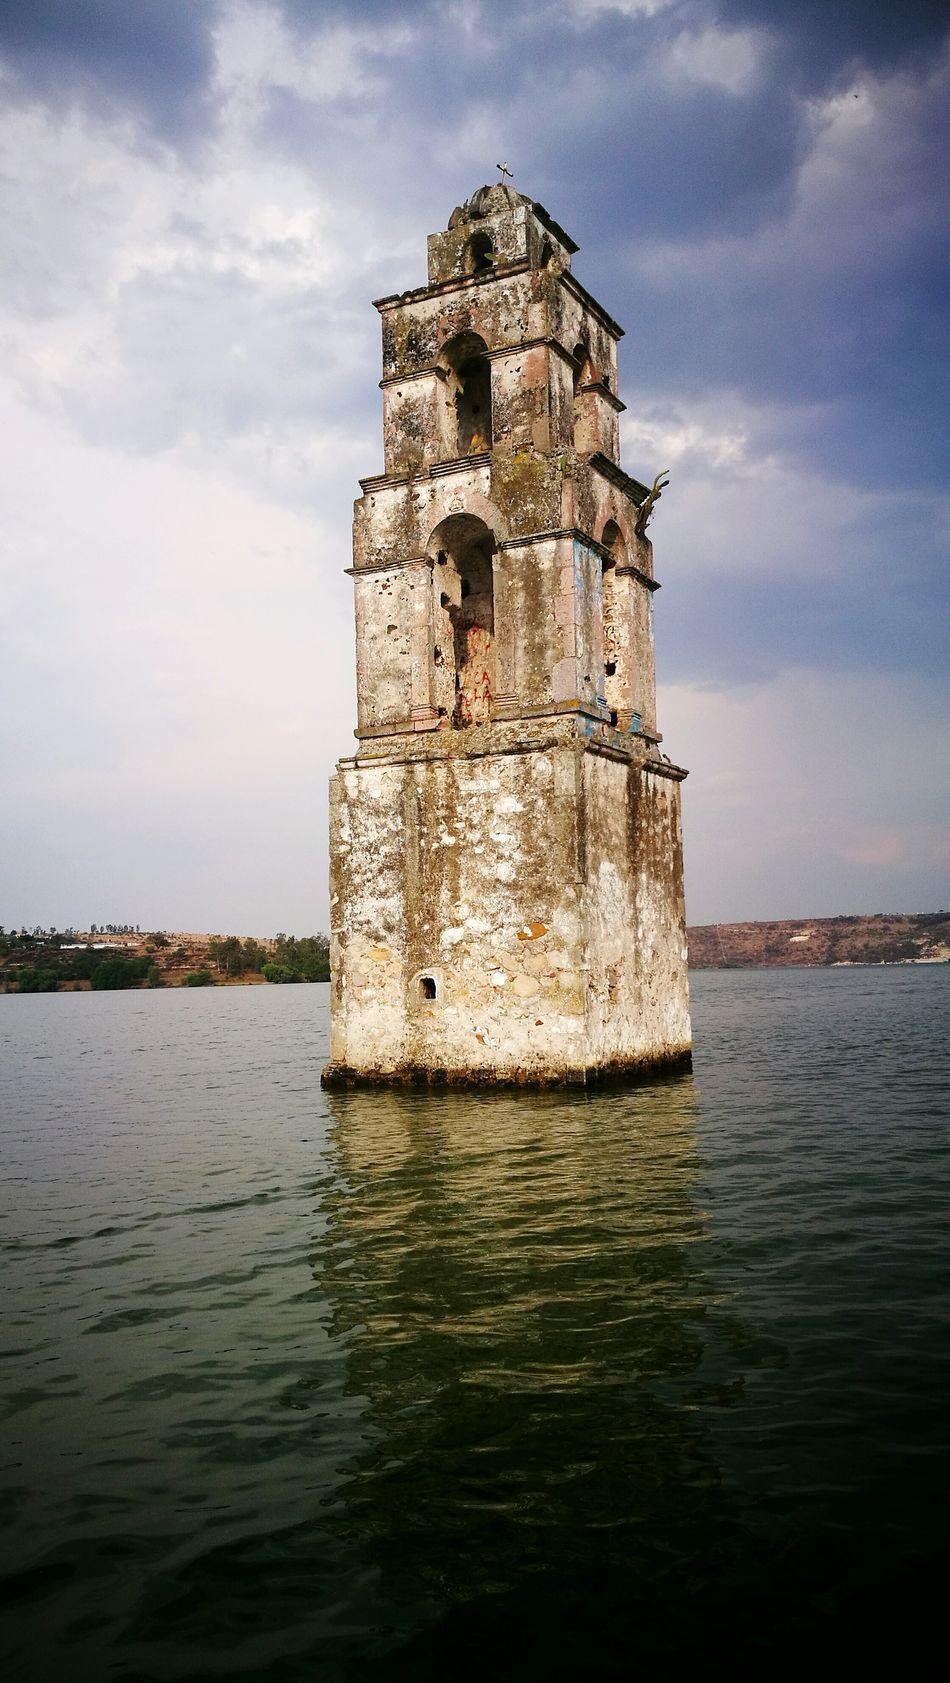 Bell Tower Tower Mexico Underwater Inundations Church Tower Church Iglesia Inundado Torre Campanario